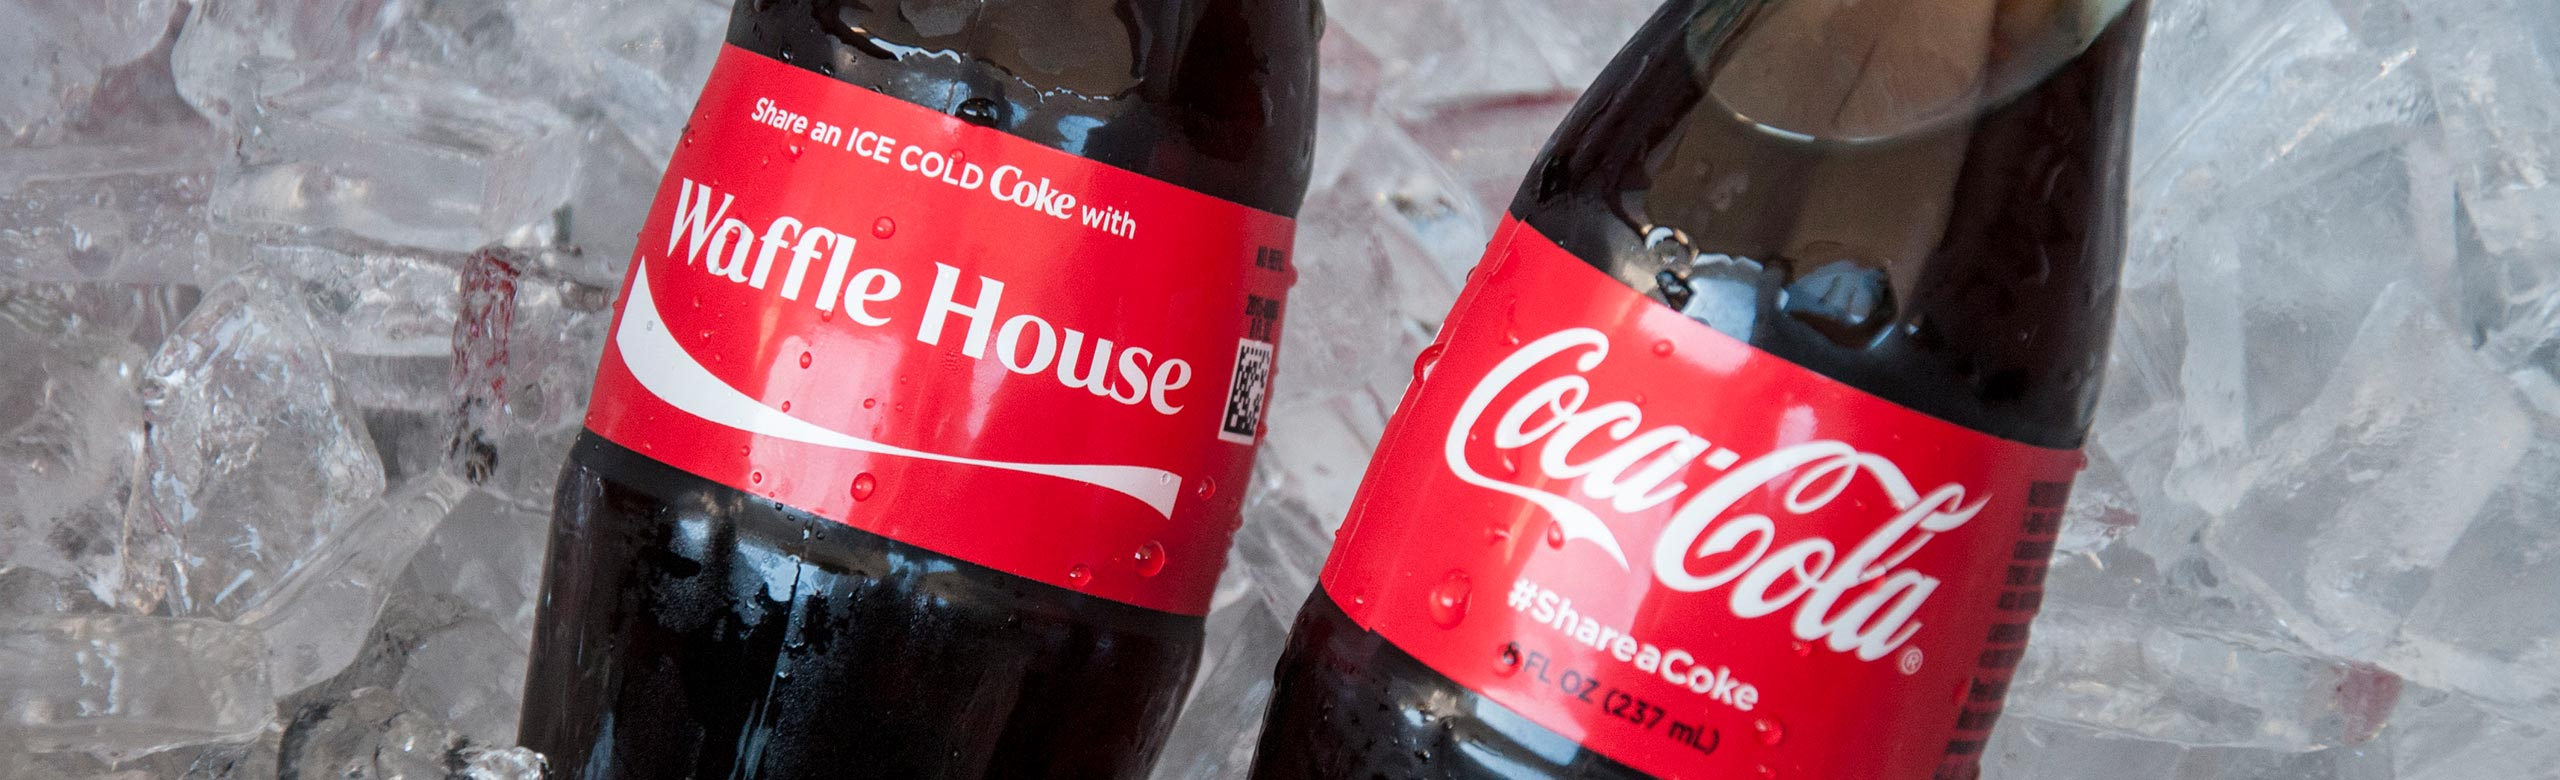 Waffle House & Coca-Cola®